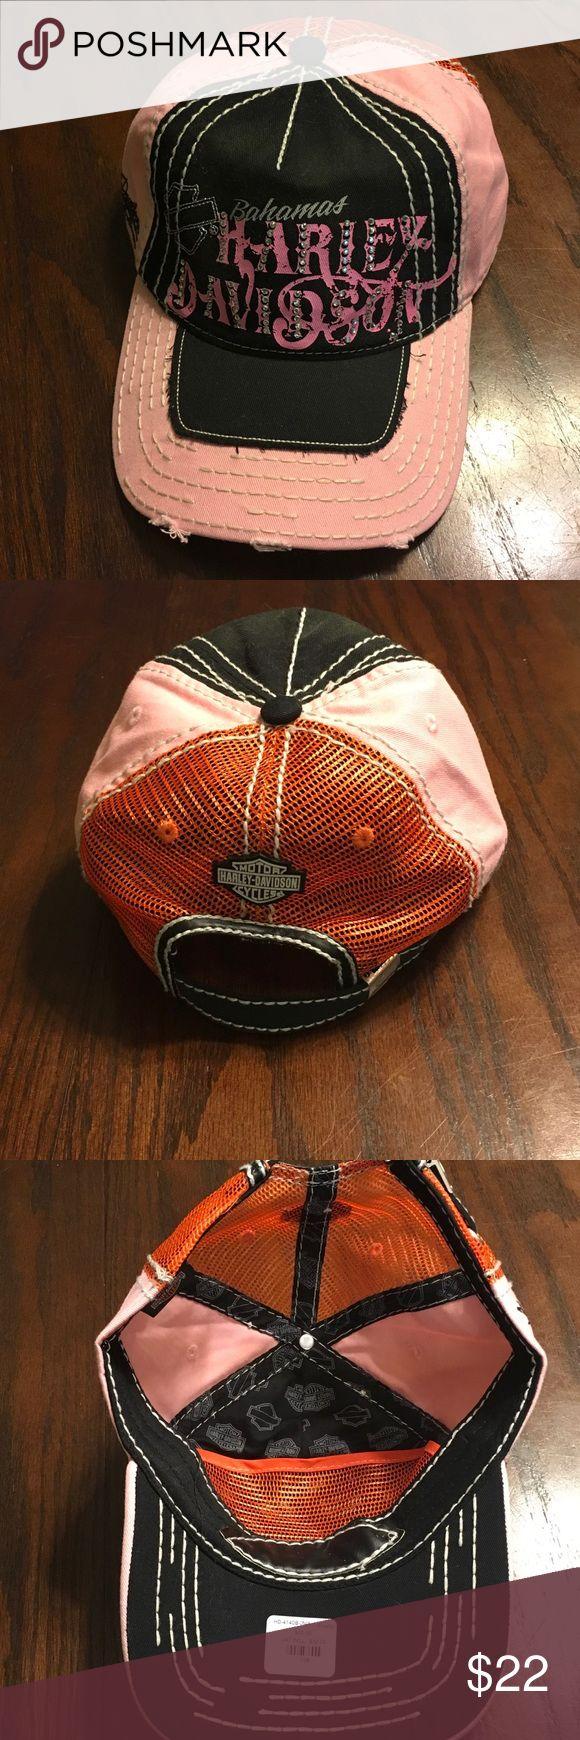 "Women's Harley Davidson hat Women's Harley Davidson""Bahamas"" hat. New and never worn. Pink/black/orange distressed look with Rhinestones. Adjustable for size Harley-Davidson Accessories Hats"